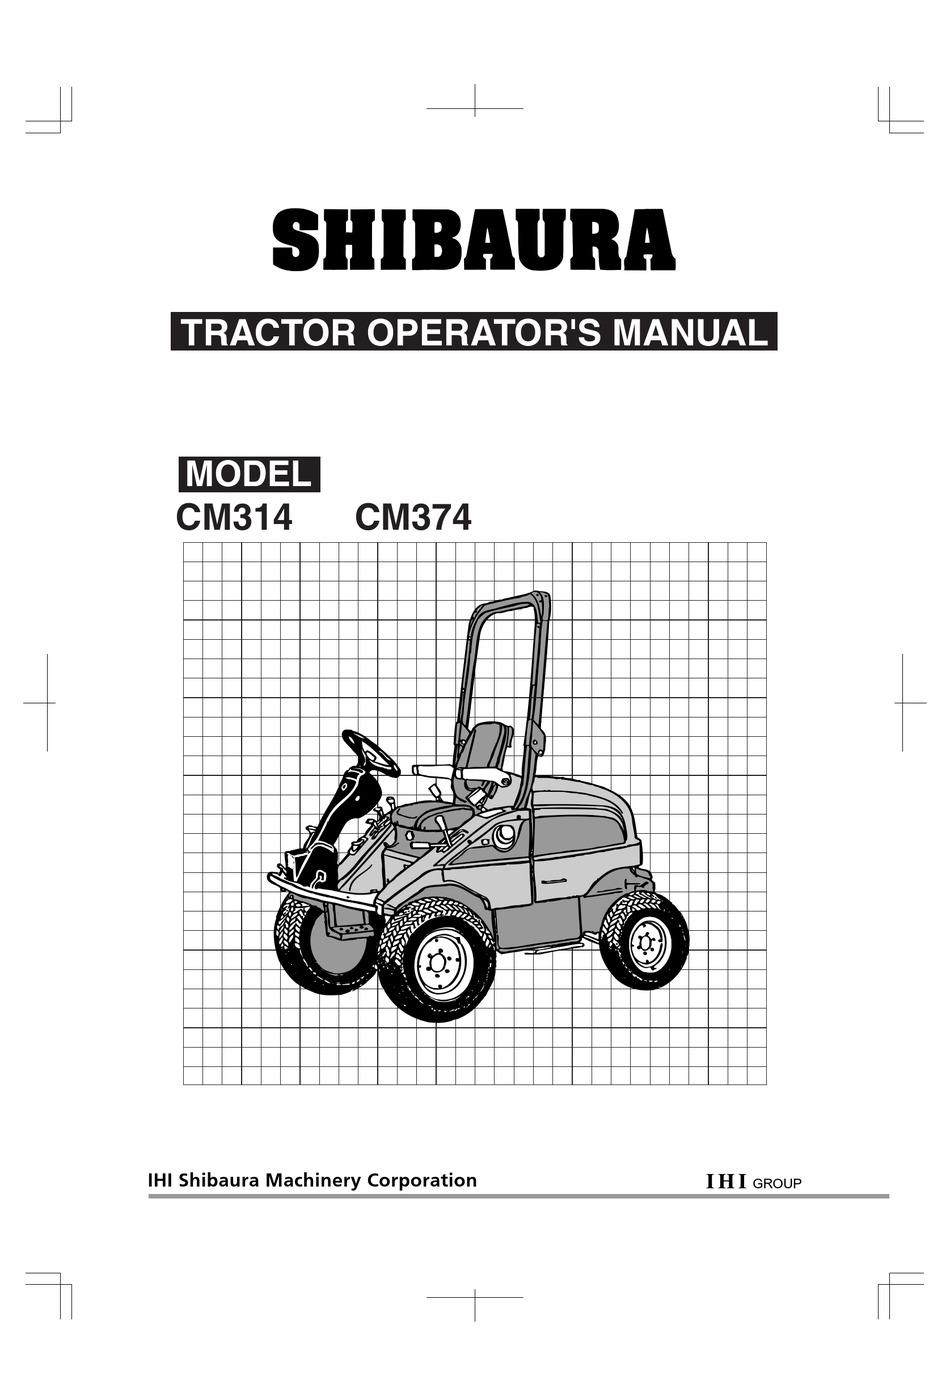 Shibaura Cm314 Operator S Manual Pdf Download Manualslib